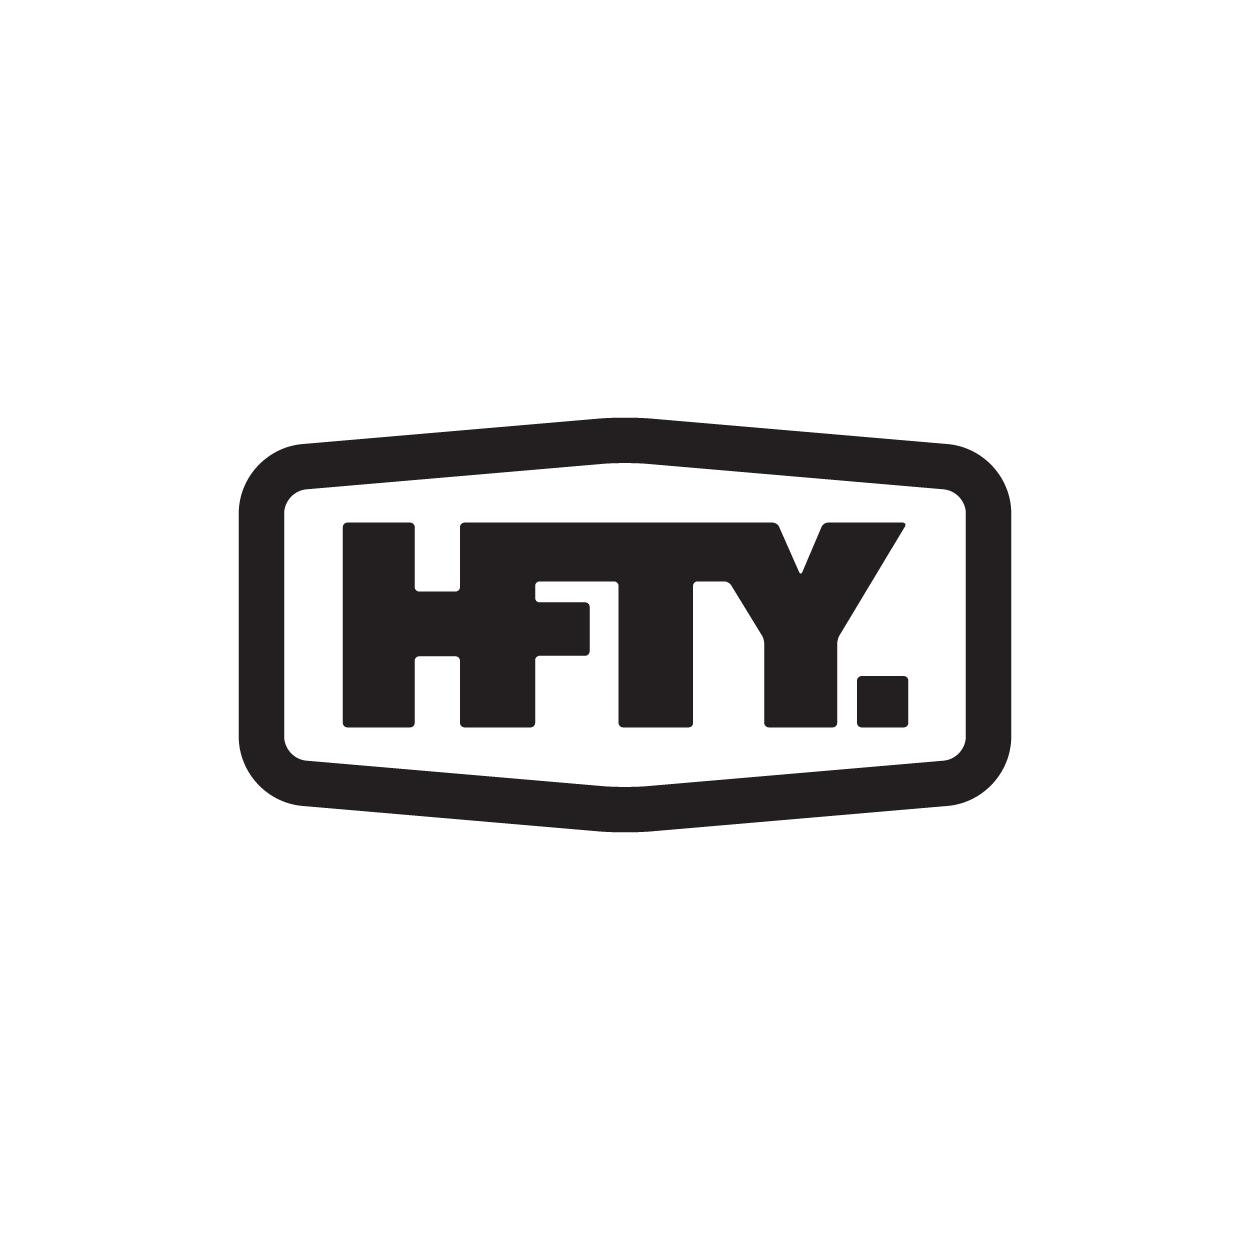 HFTY logo design by logo designer Paul Sirmon LLC